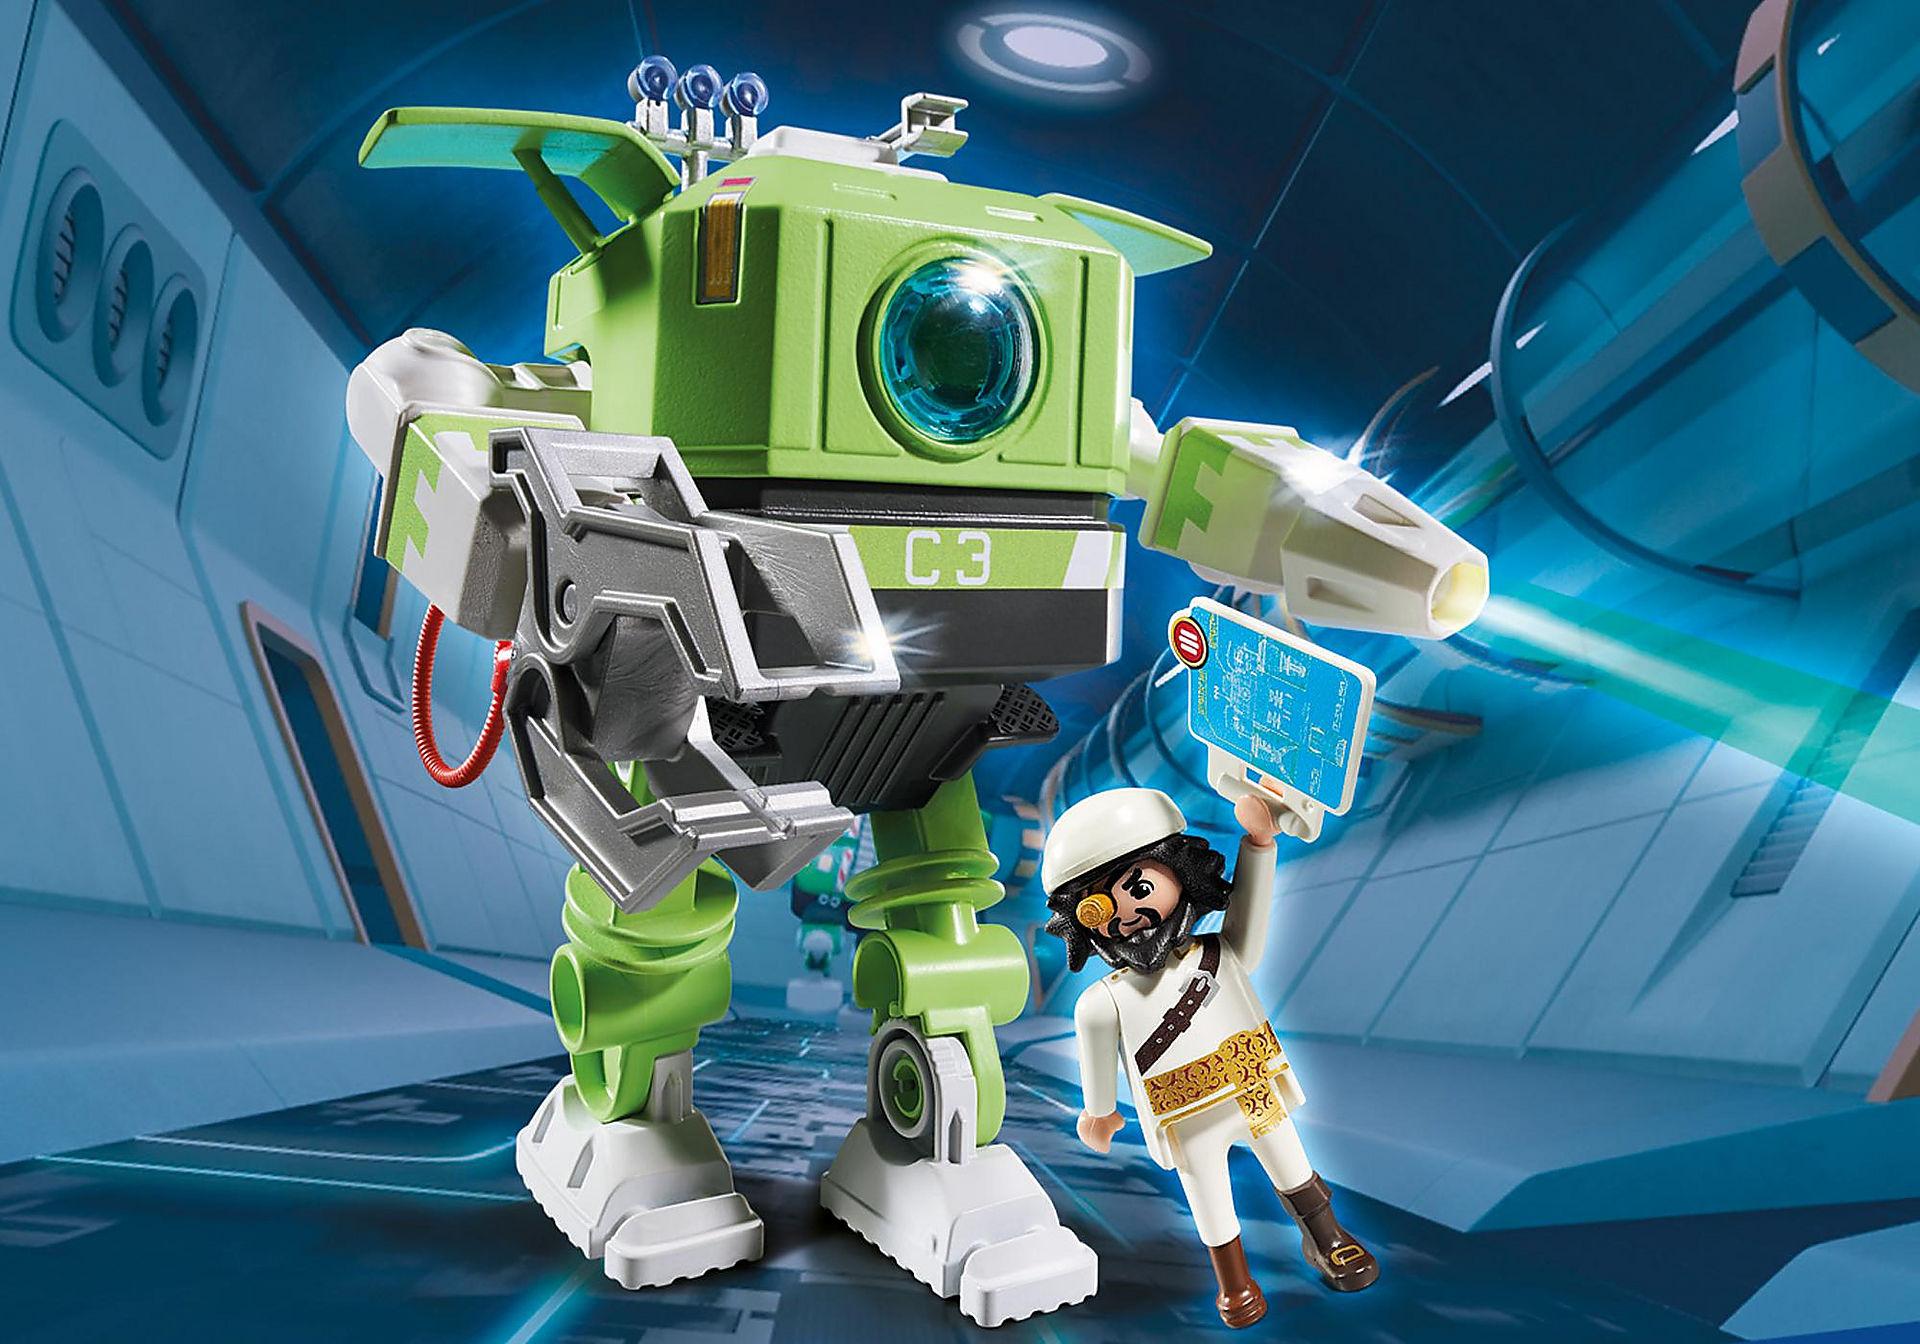 http://media.playmobil.com/i/playmobil/6693_product_detail/Робот Клеано